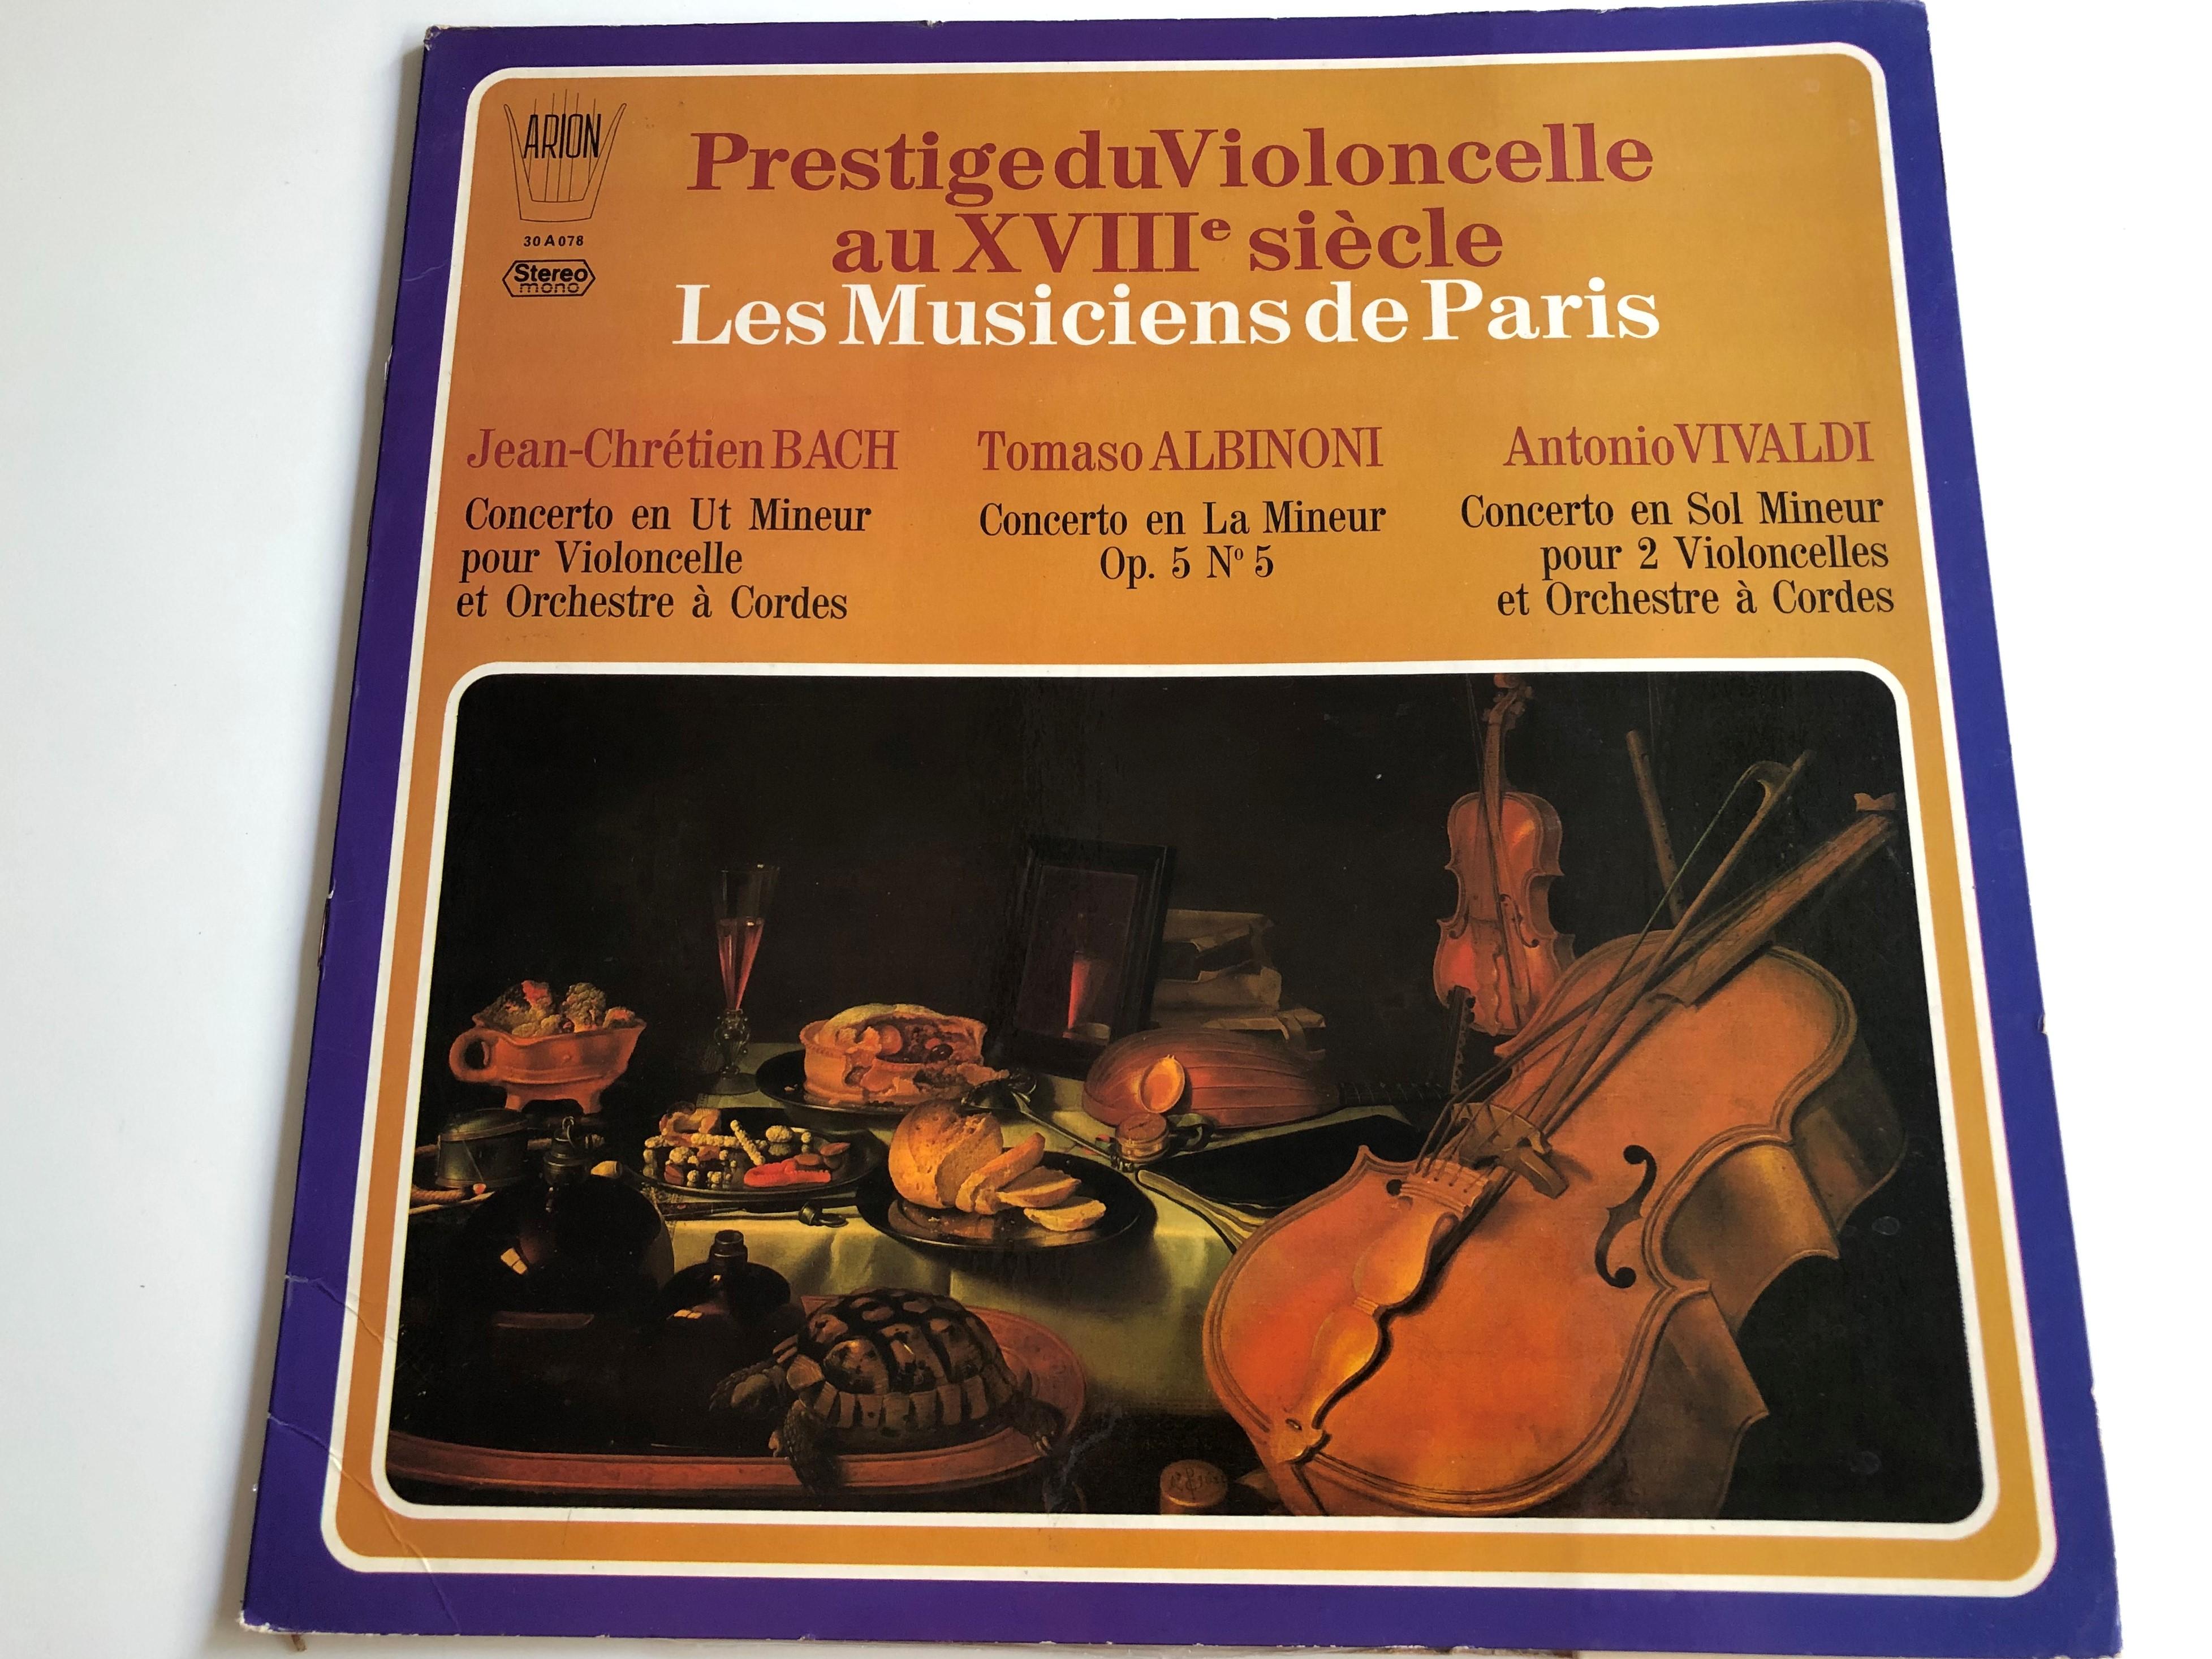 prestige-du-violoncelle-au-xviii-e-siecle-les-musiciens-de-paris-jean-chr-tien-bach-tomaso-albinoni-antonio-vivaldi-arion-30a078-lp-stereo-mono-1-.jpg